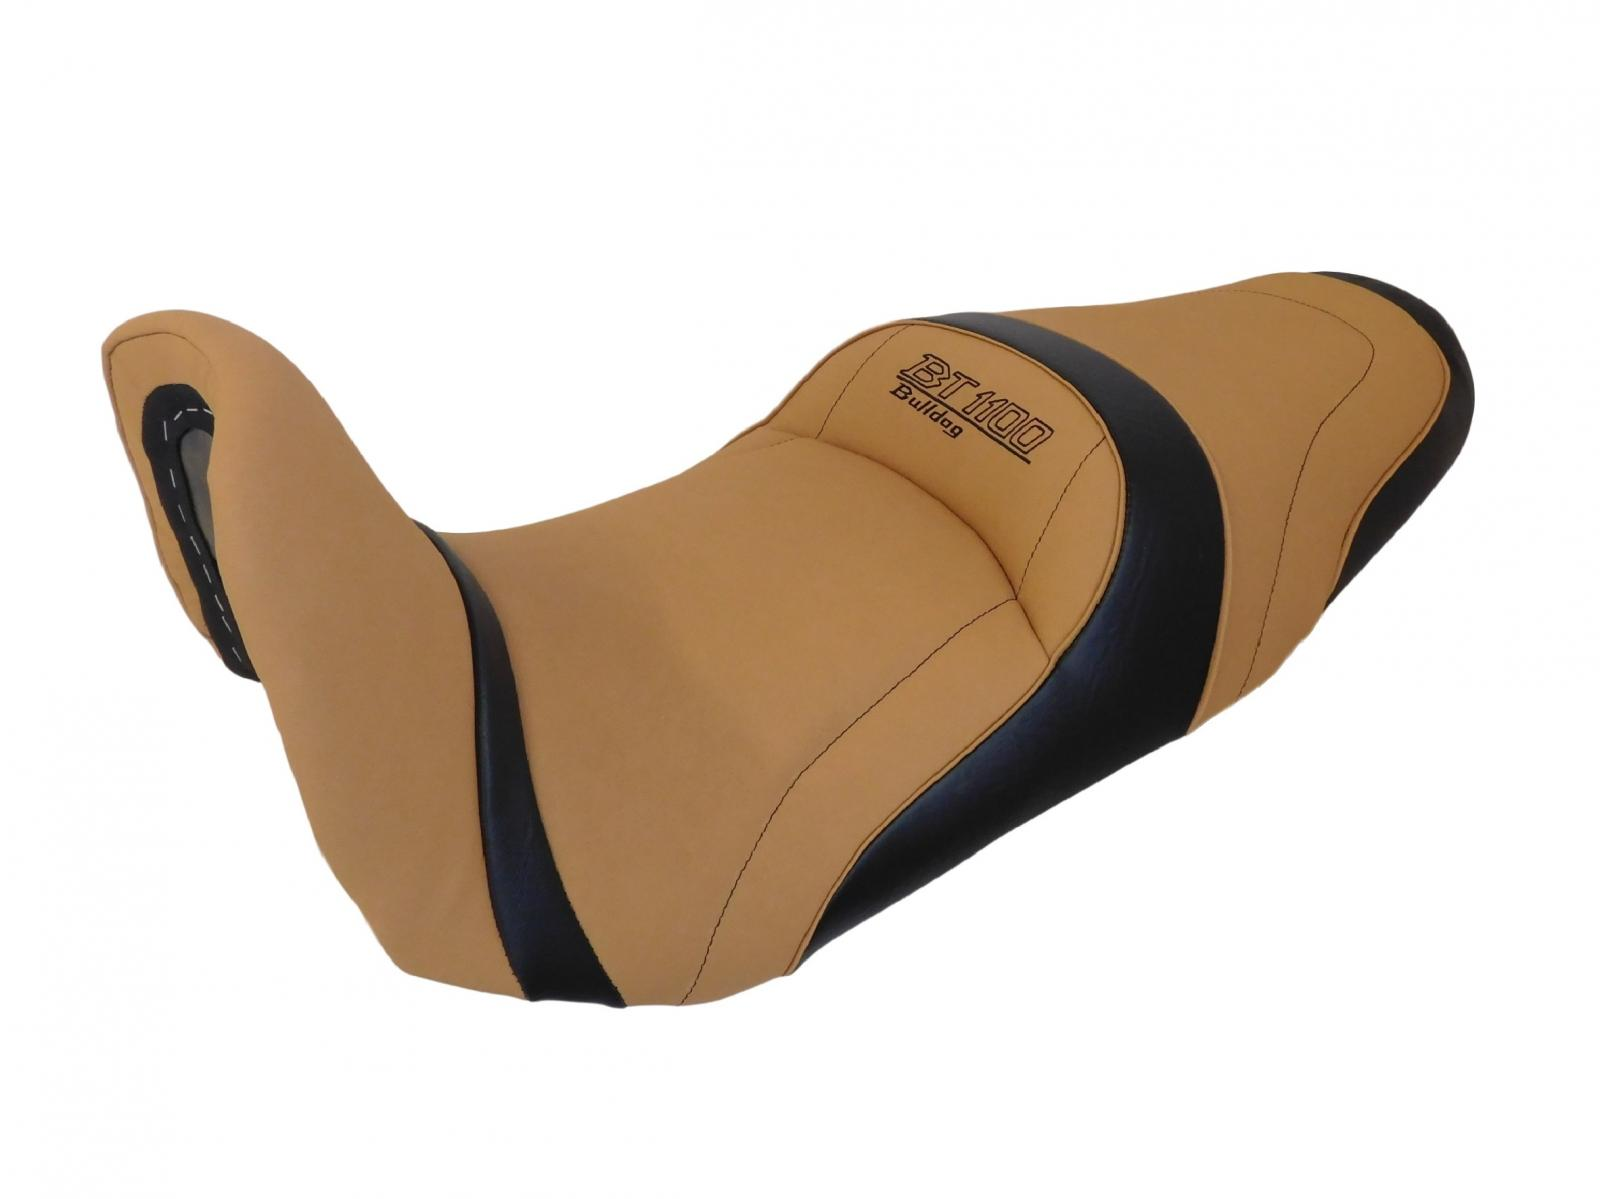 Sella Grande Confort SGC4850 - YAMAHA BULLDOG BT 1100 [2001-2006]